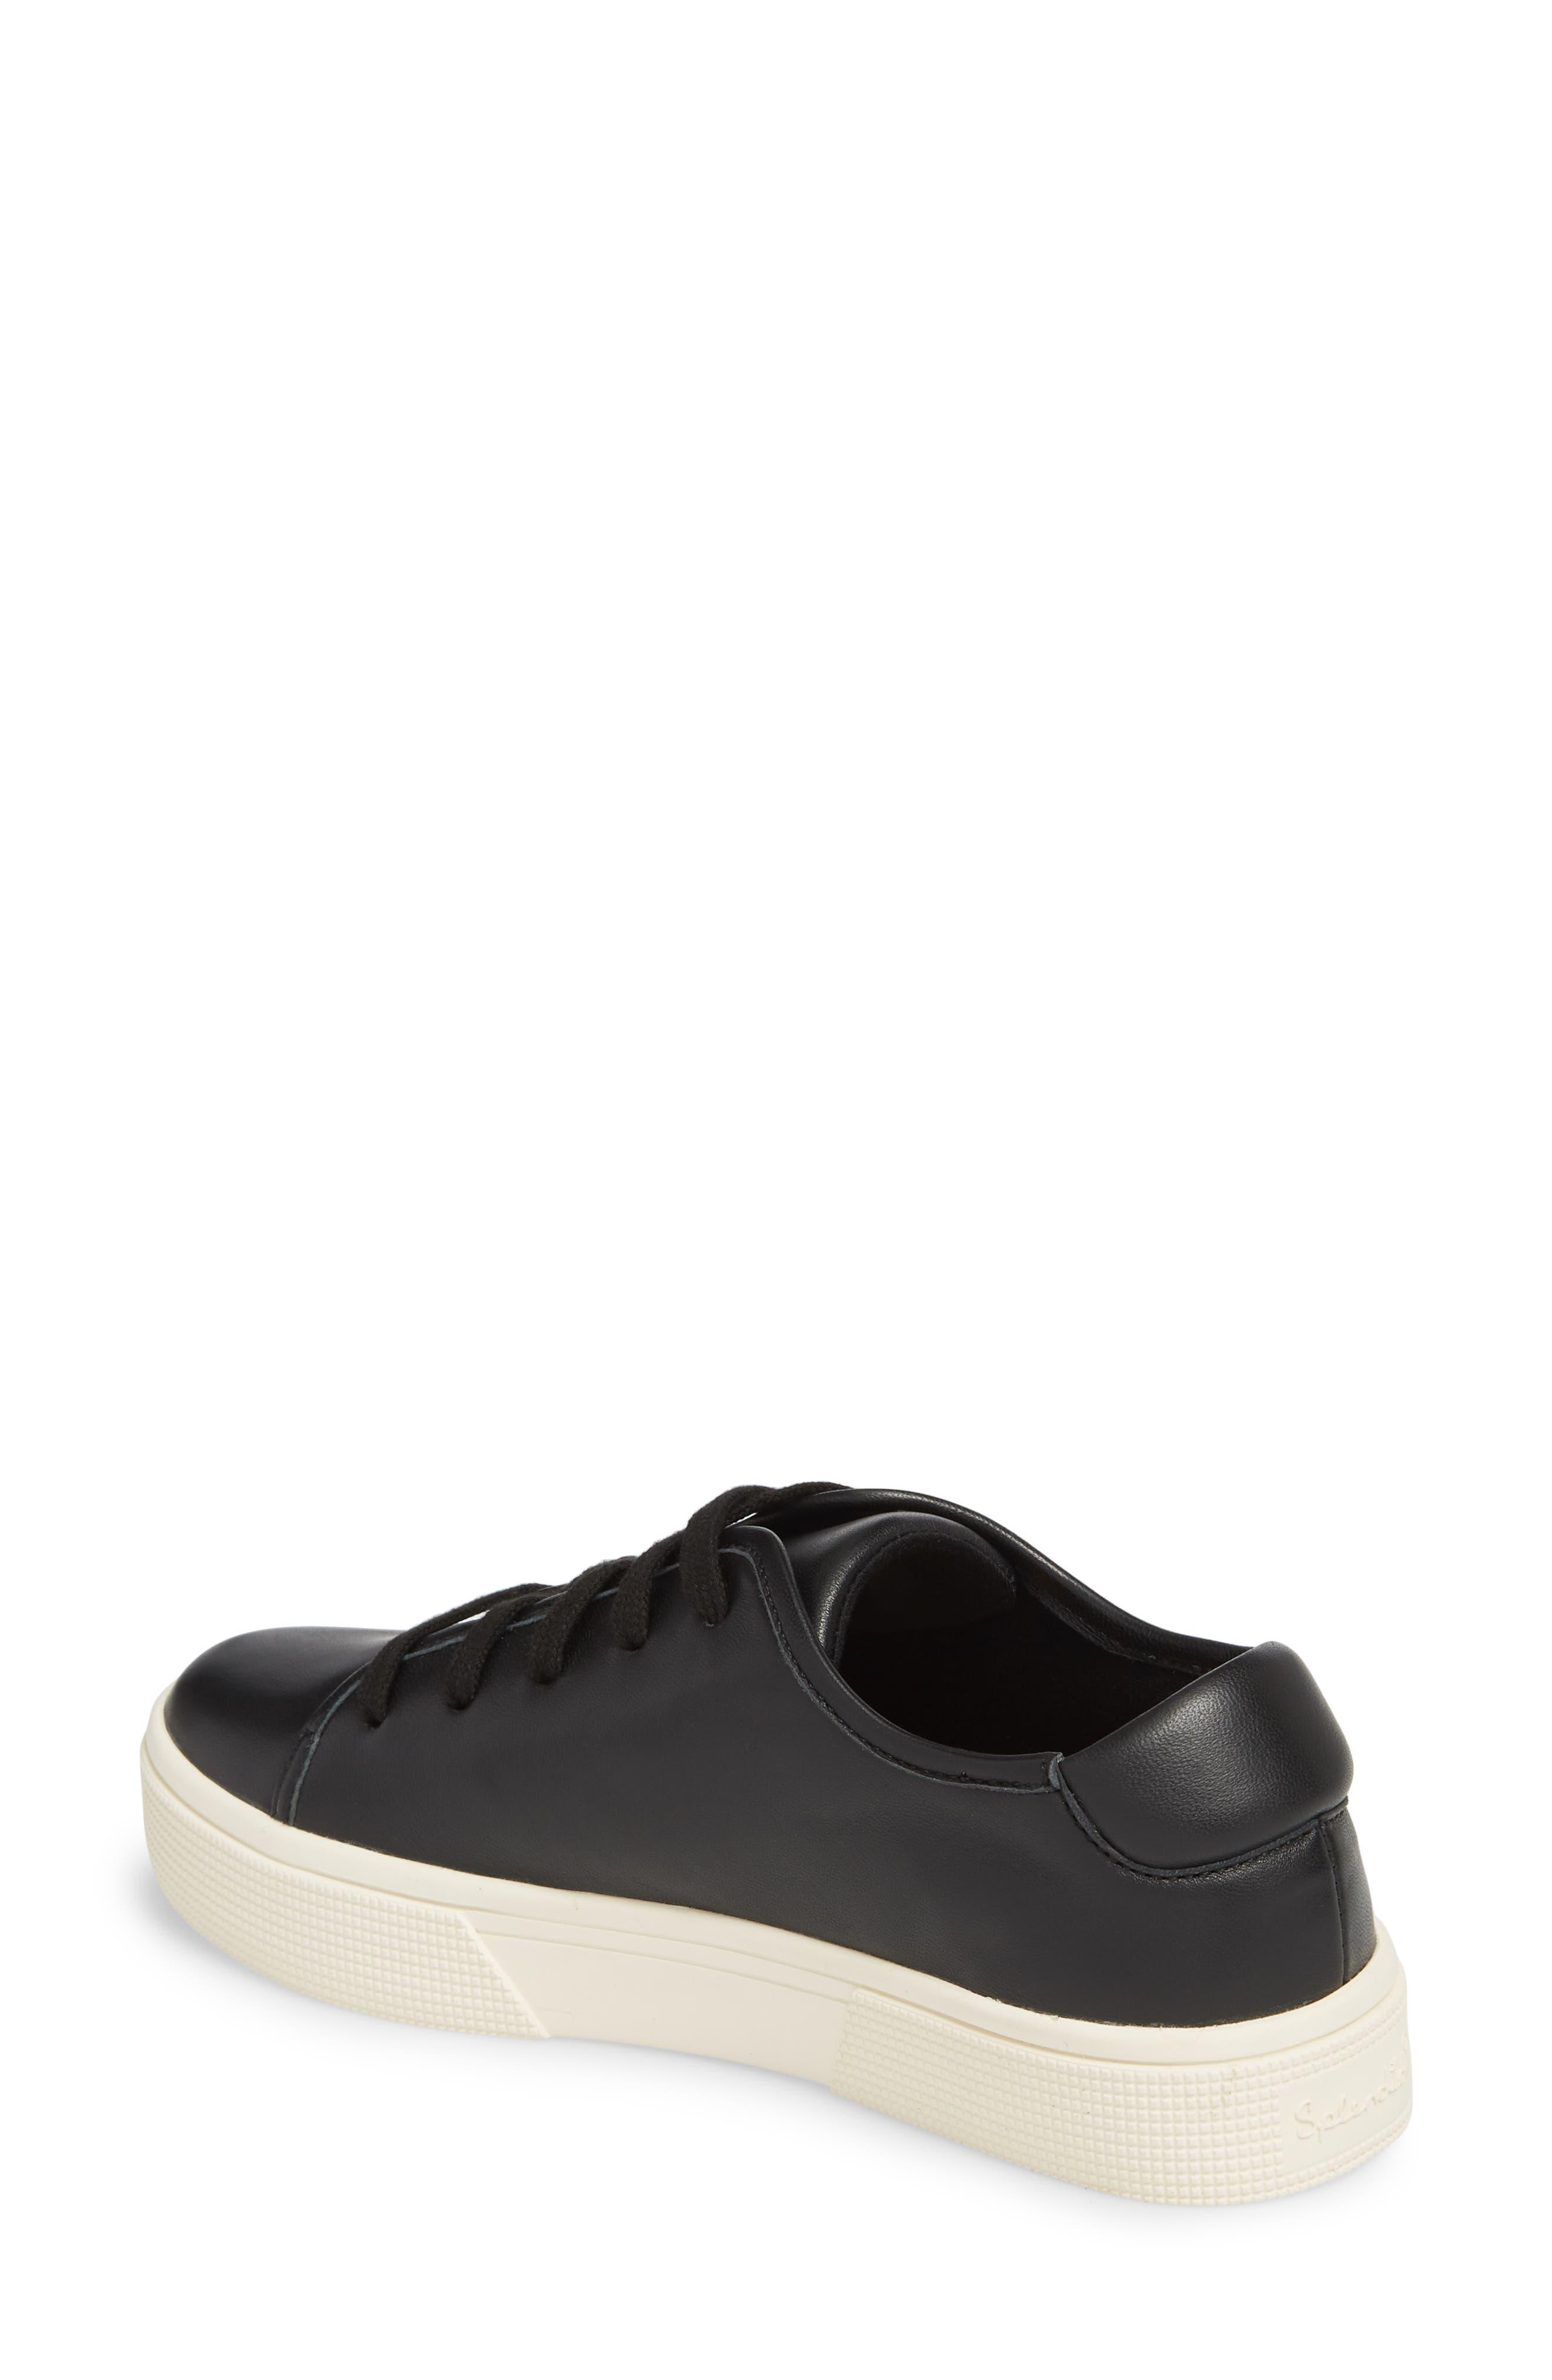 Norvin Sneaker,                             Alternate thumbnail 2, color,                             BLACK LEATHER